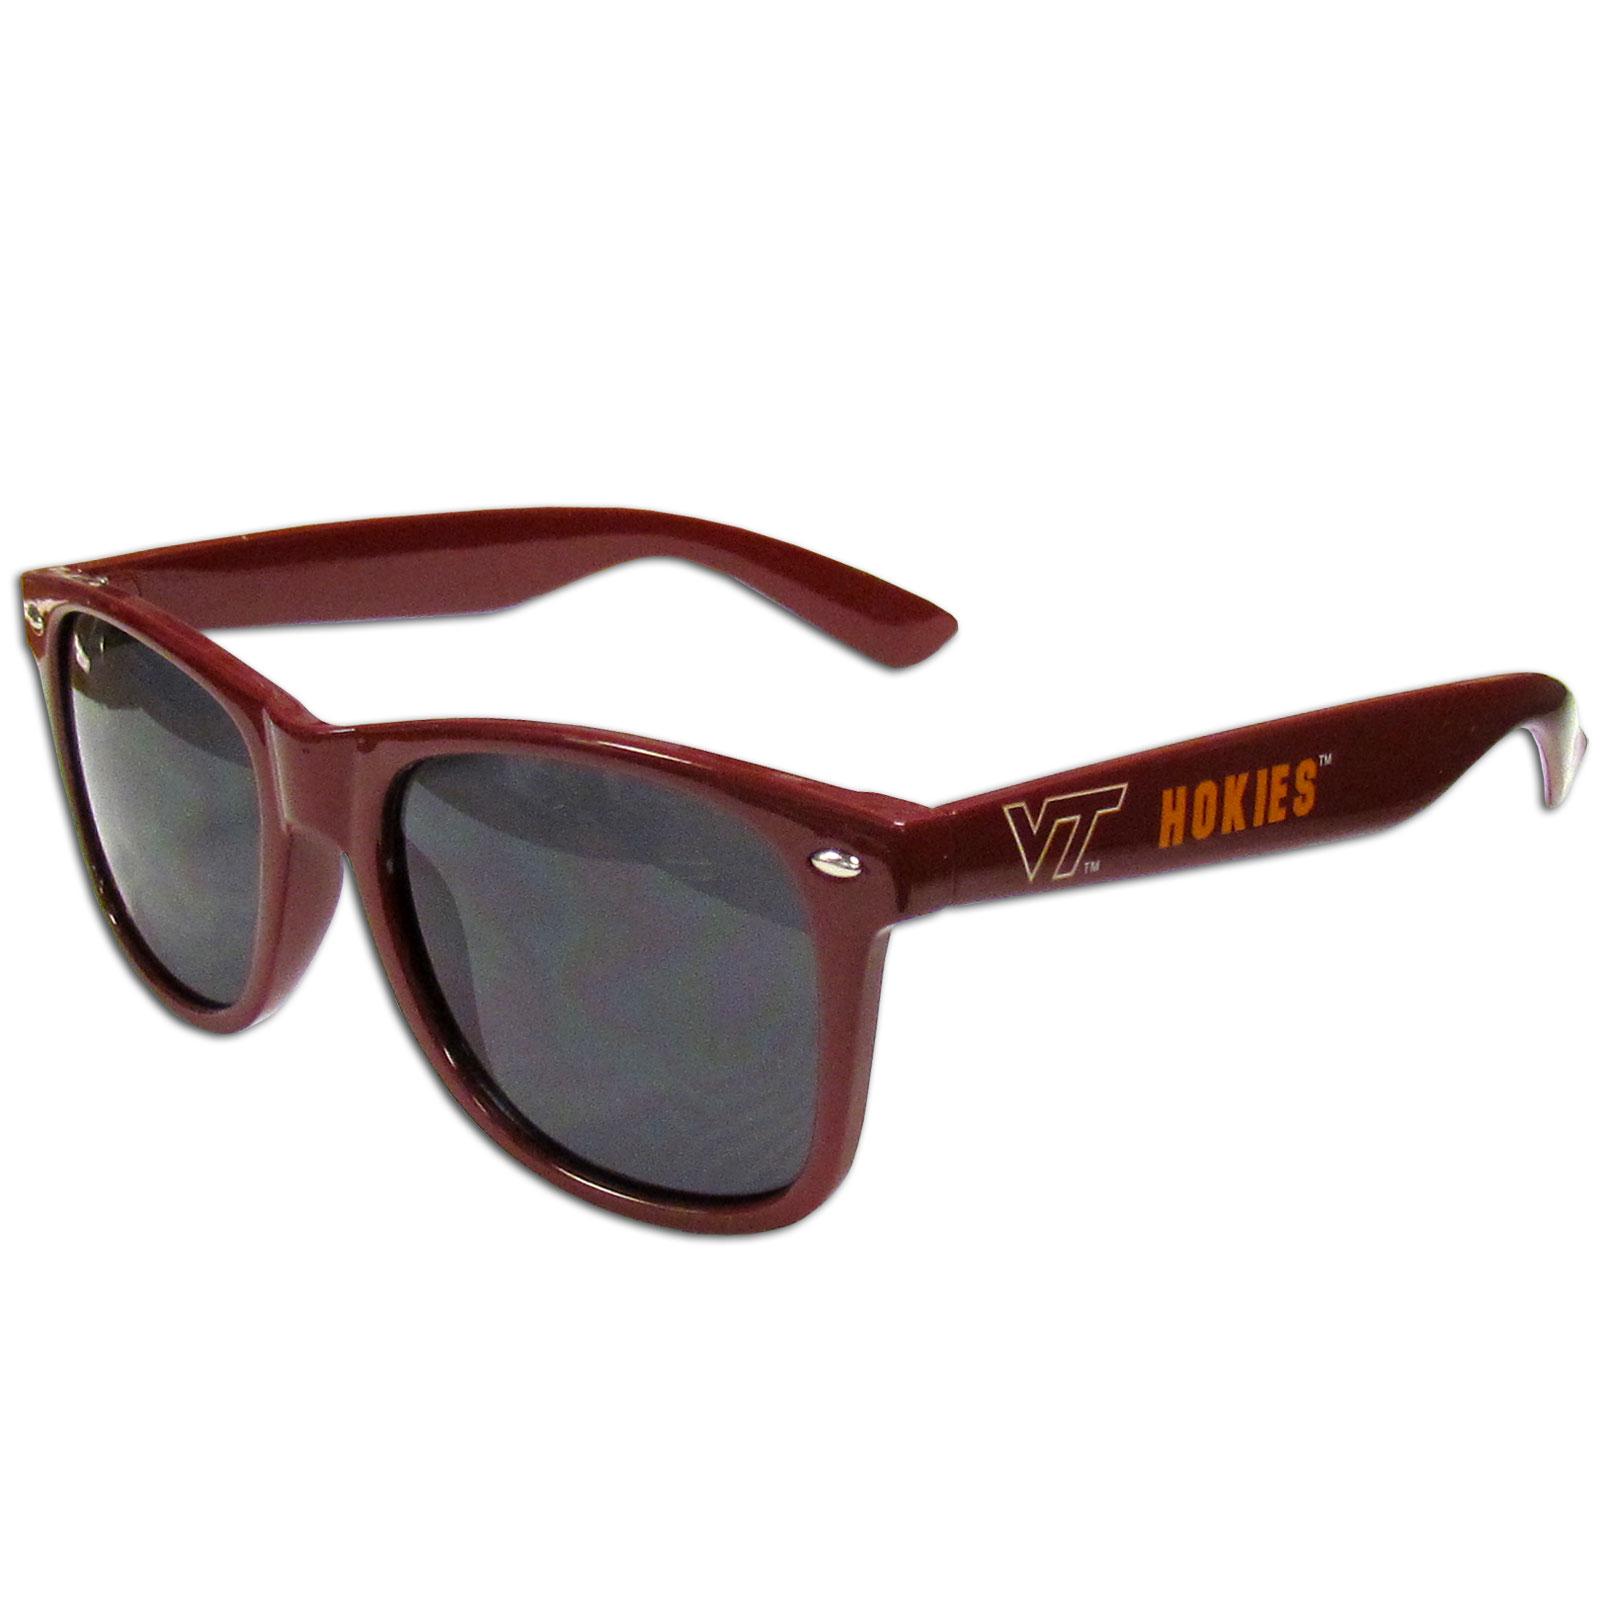 Virginia Tech Wayfarer Sunglasses